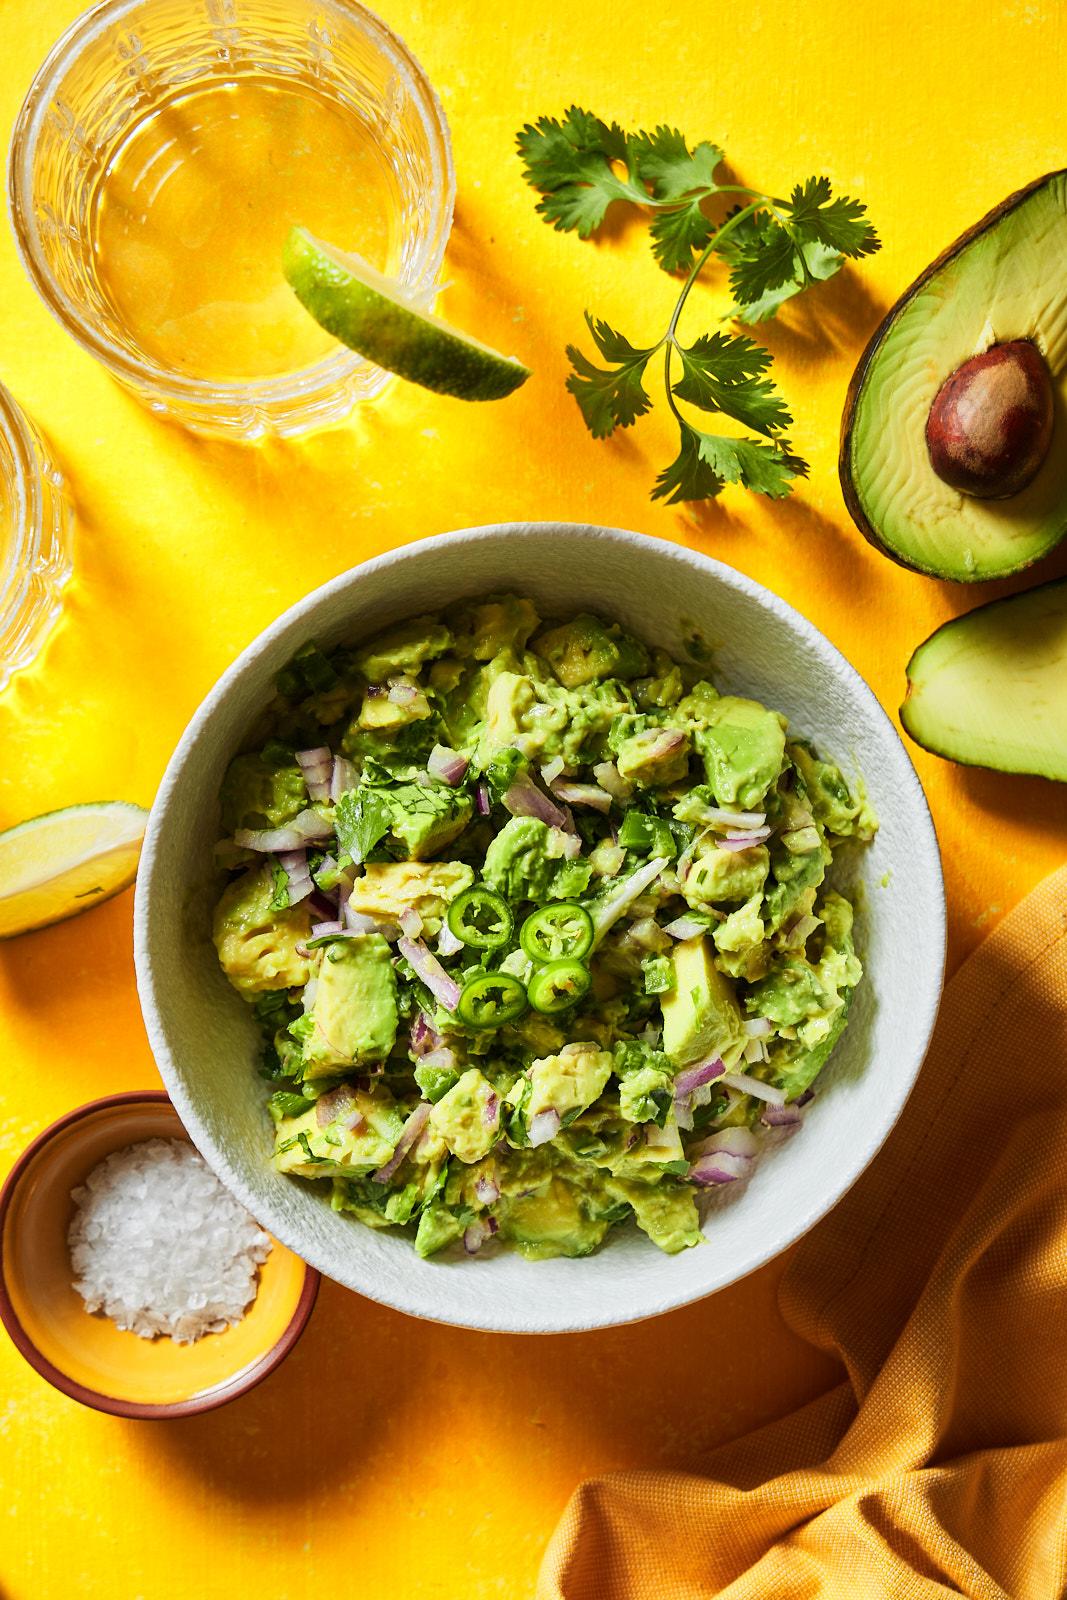 Classic homemade guacamole